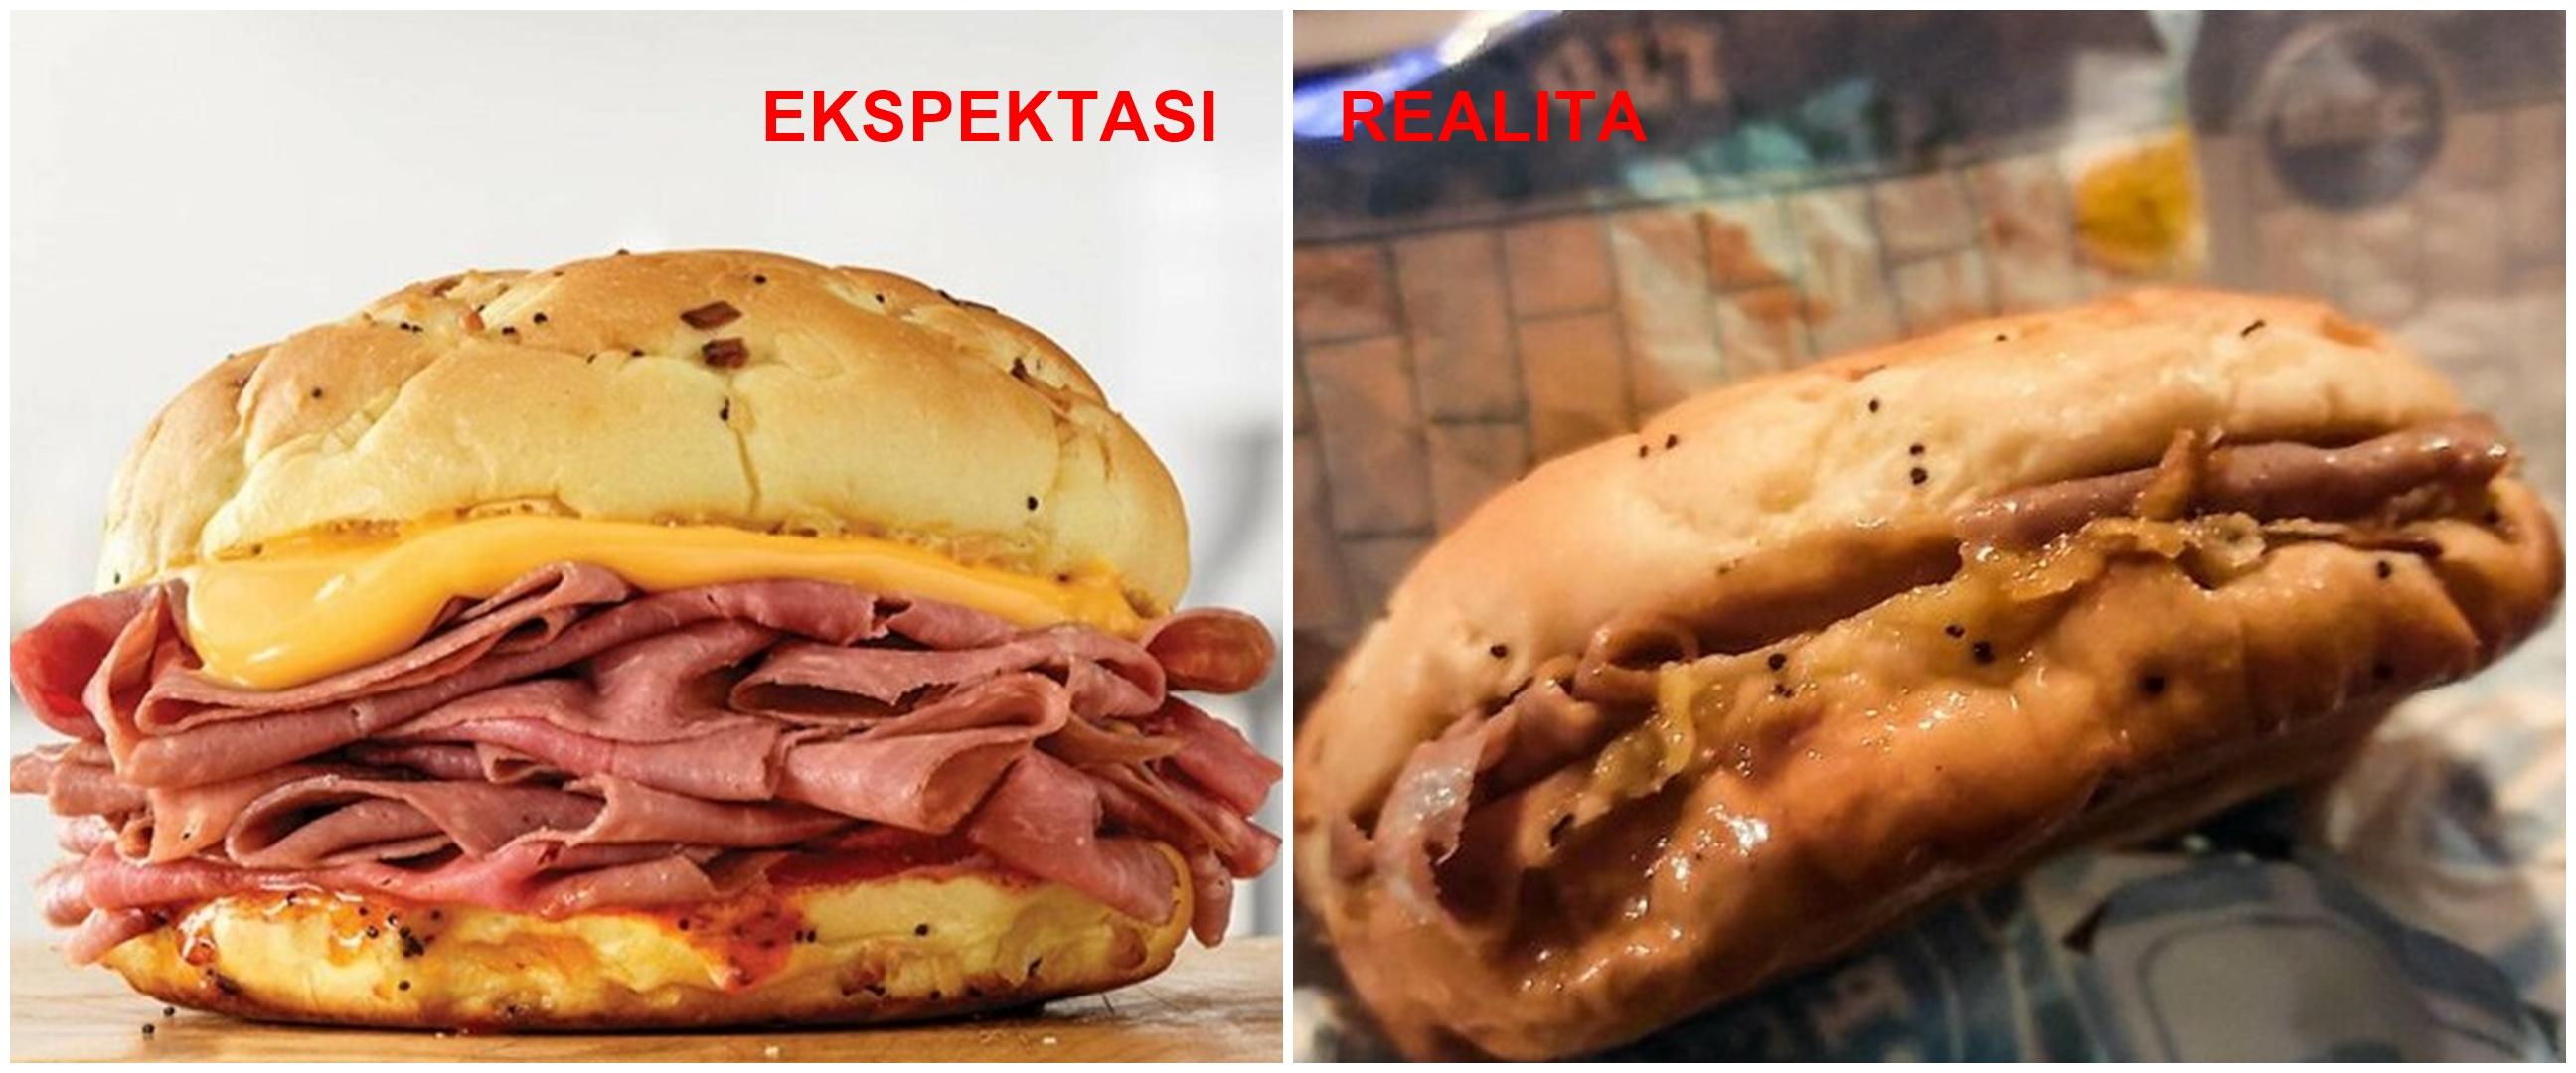 Realita vs ekspektasi 10 makanan cepat saji ini bikin lapar hilang